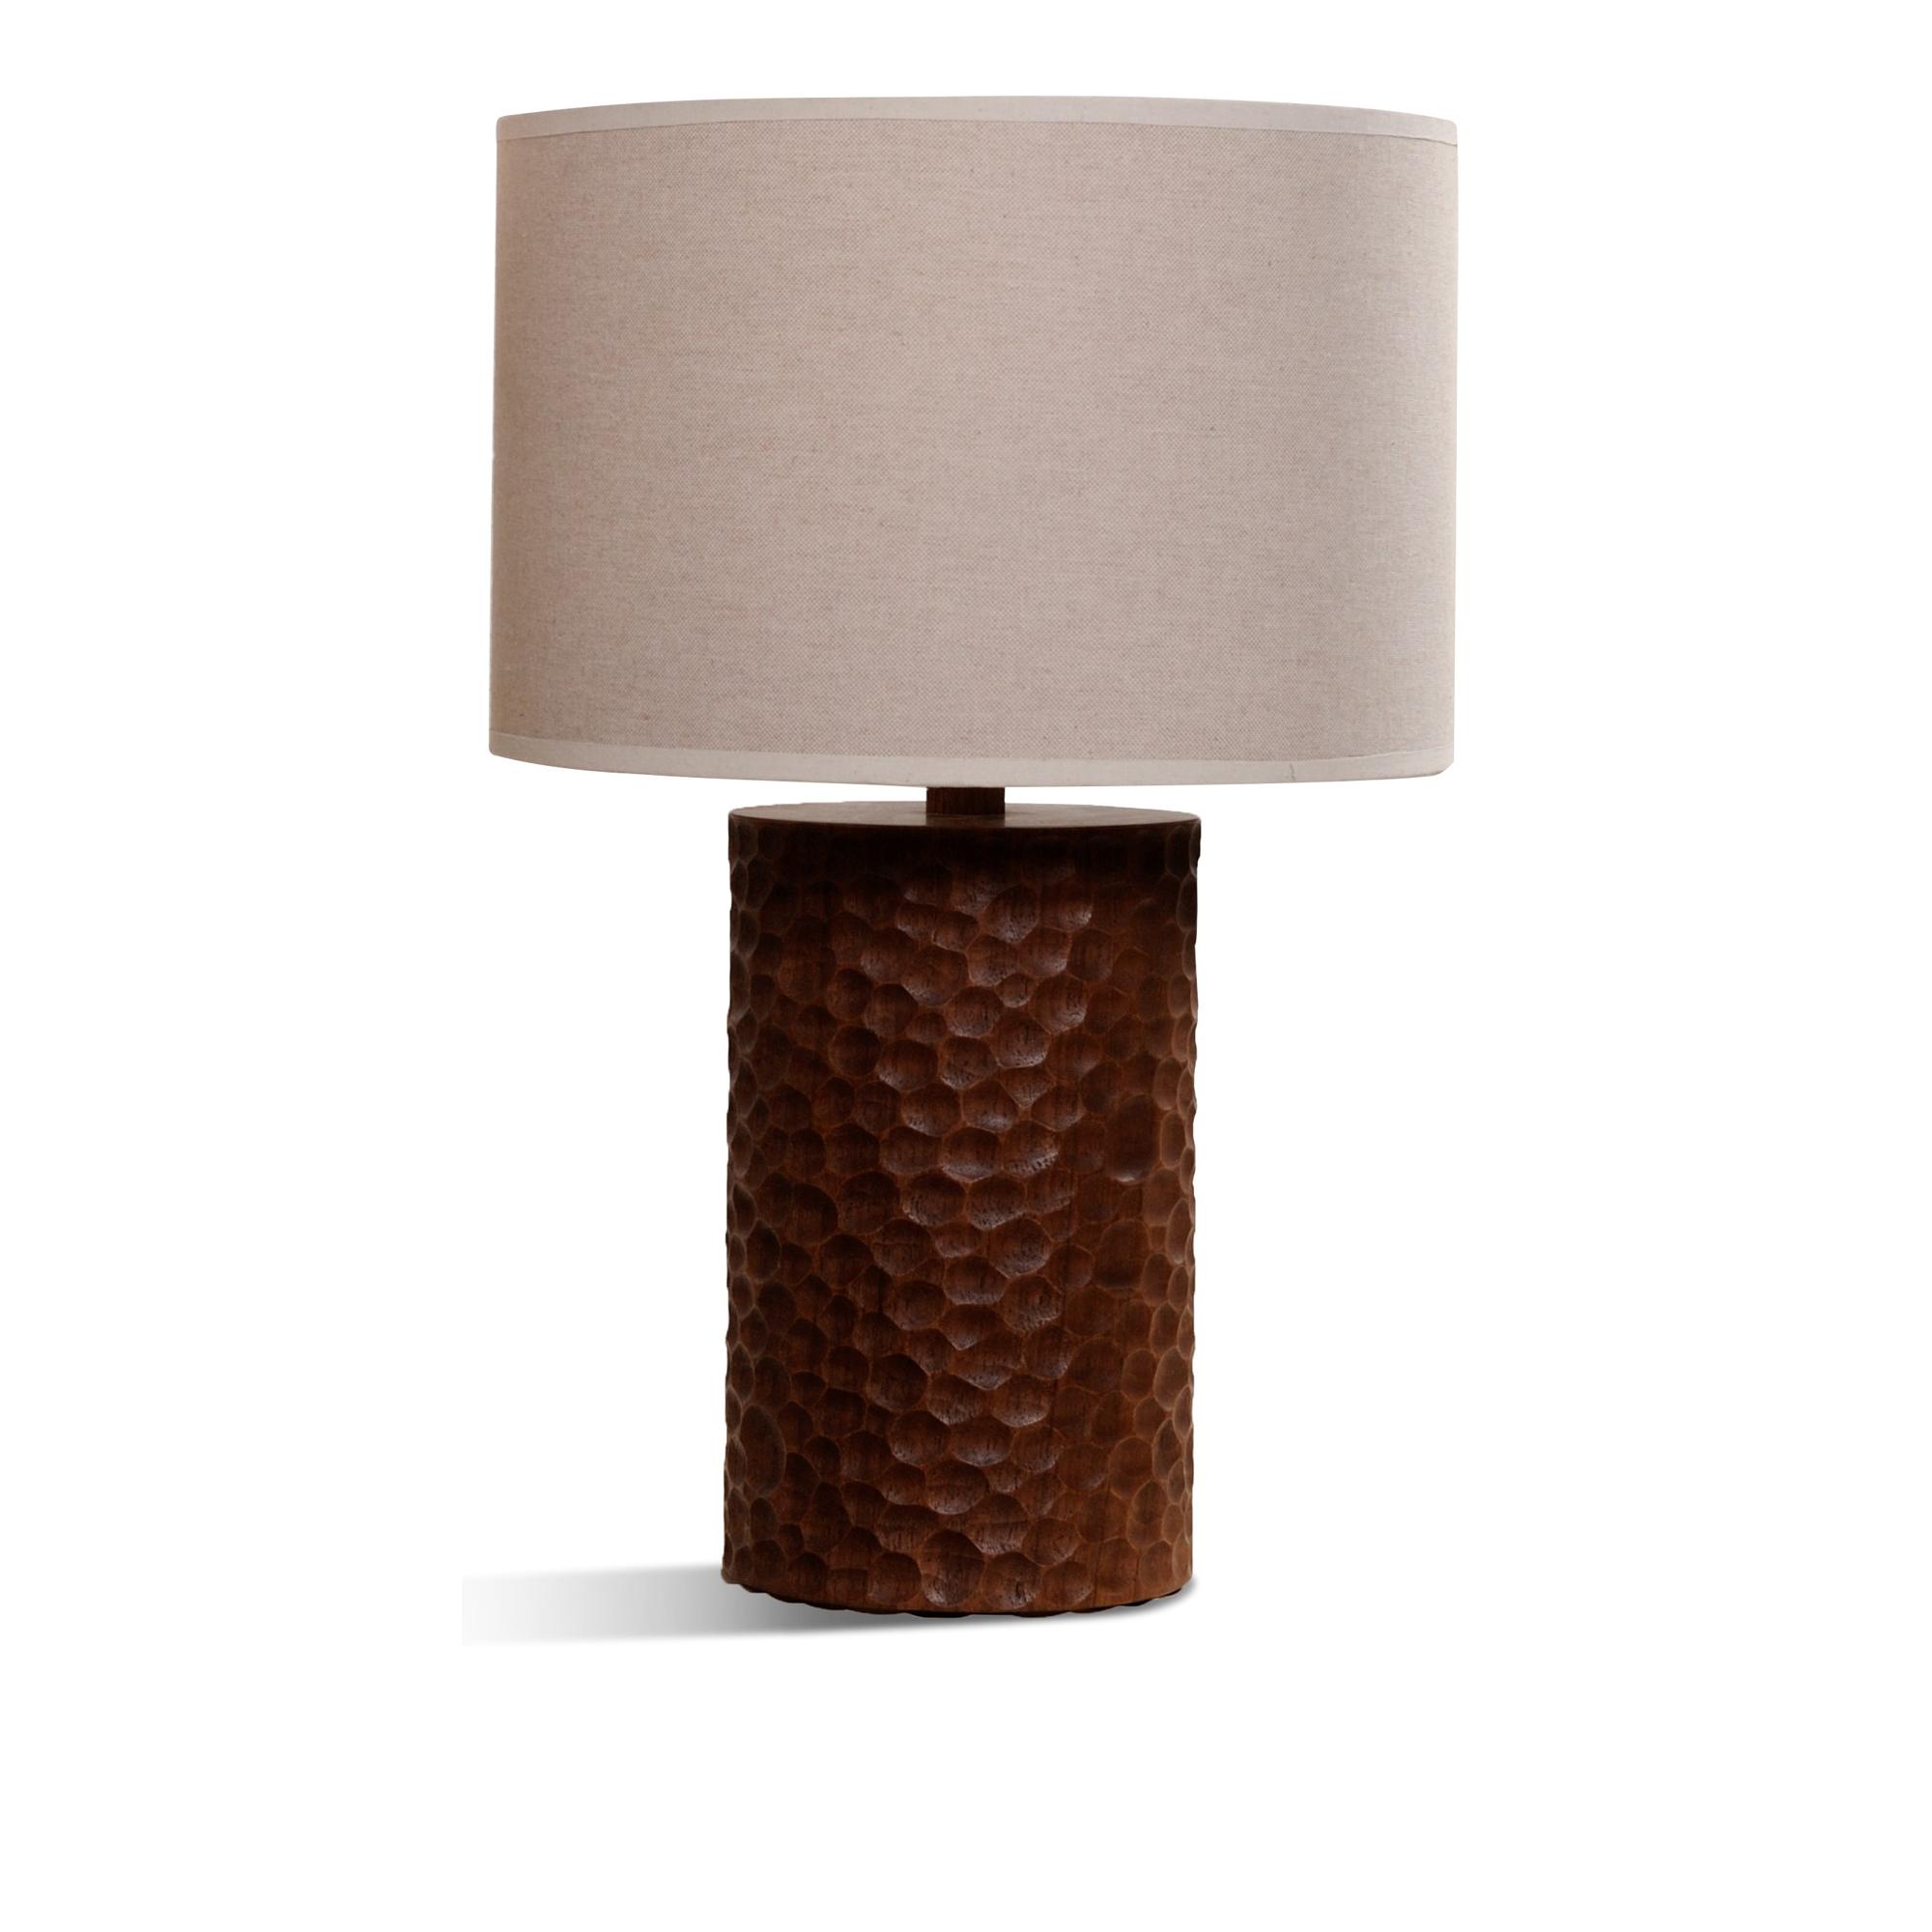 K 246 Per En Ny Lampa Till Kameran Meta Morphoz